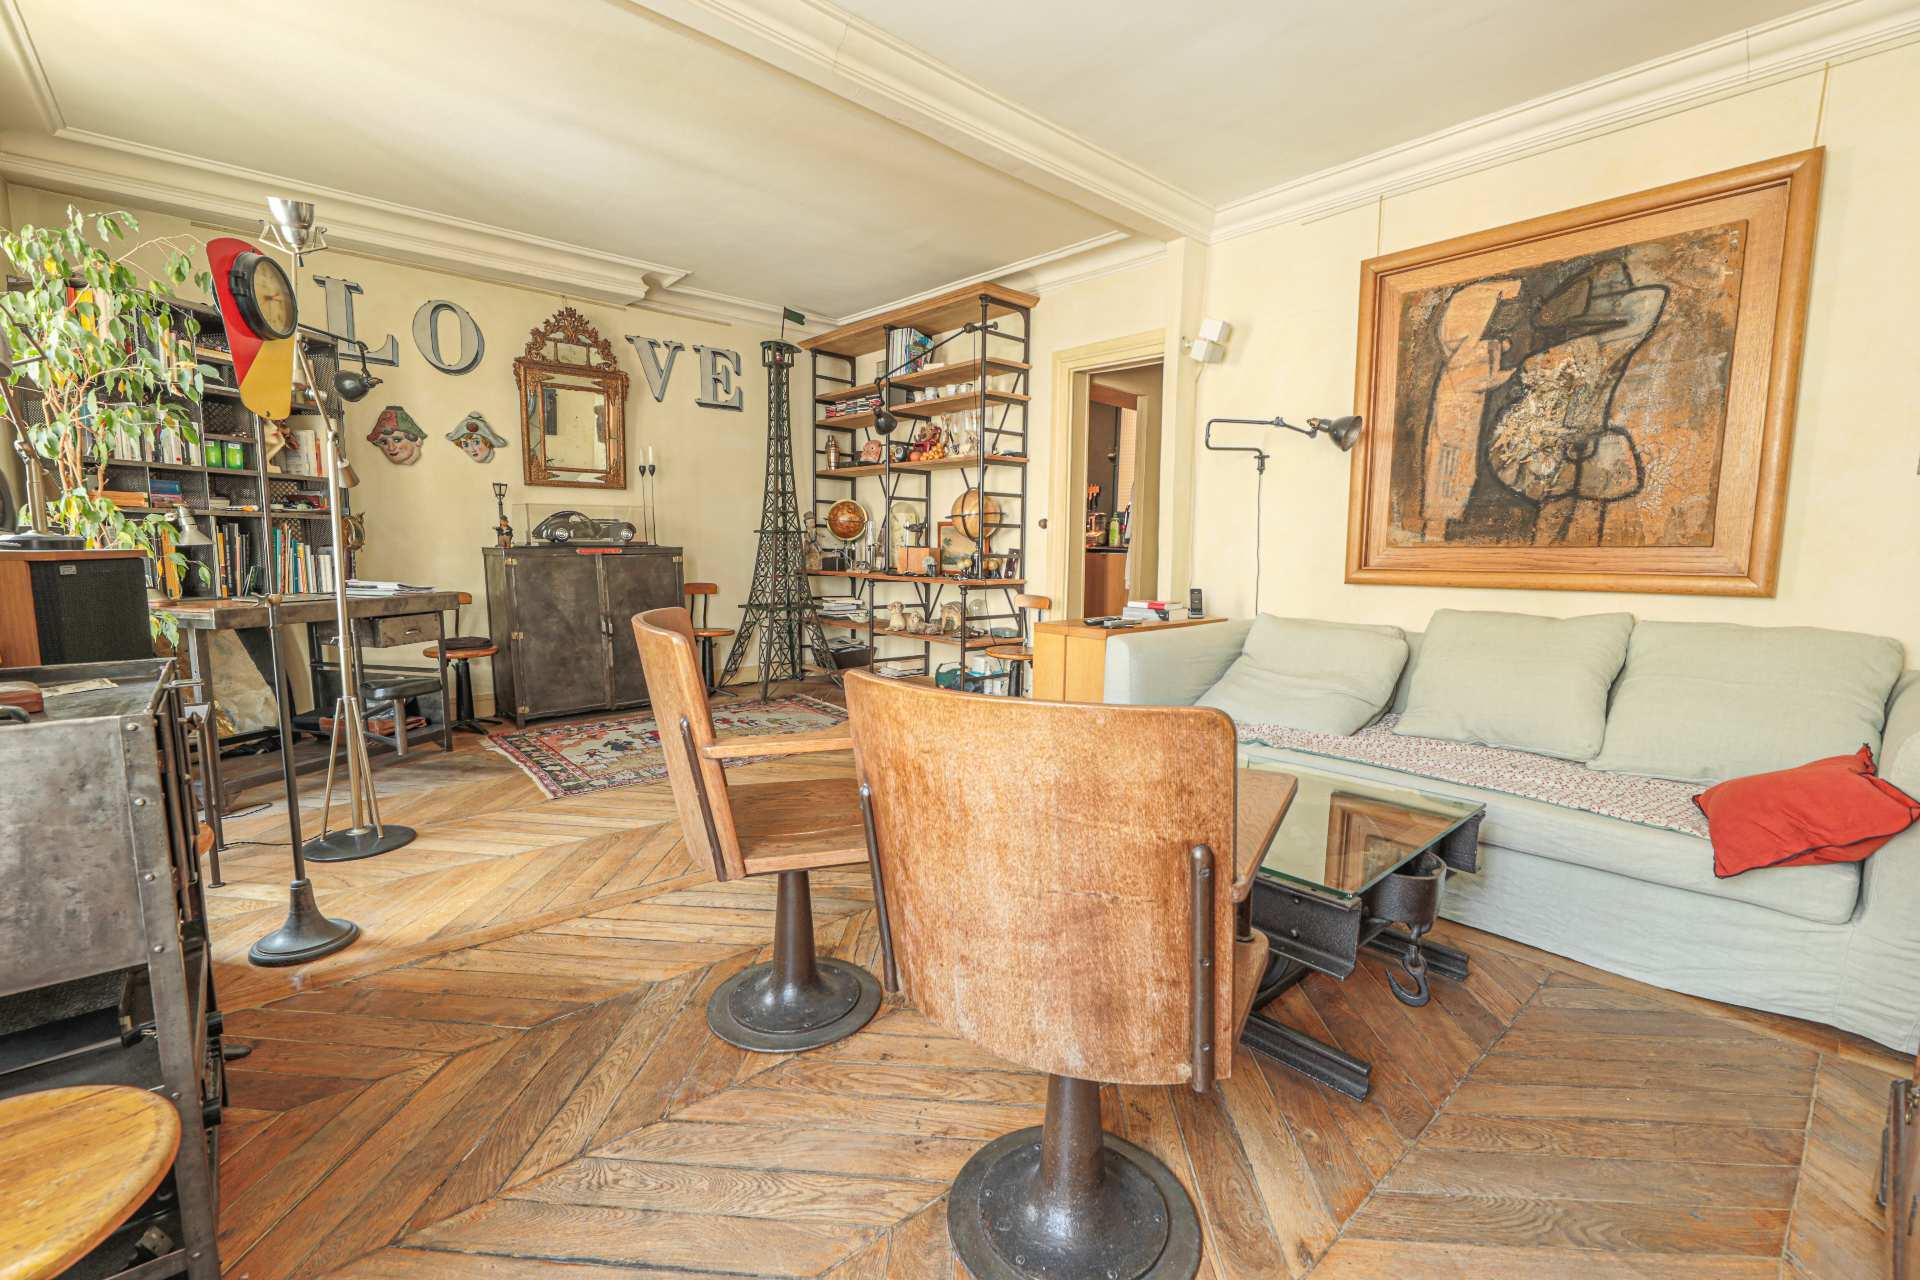 Two rooms in Montmartre (Rue Ravignan) duplex 1